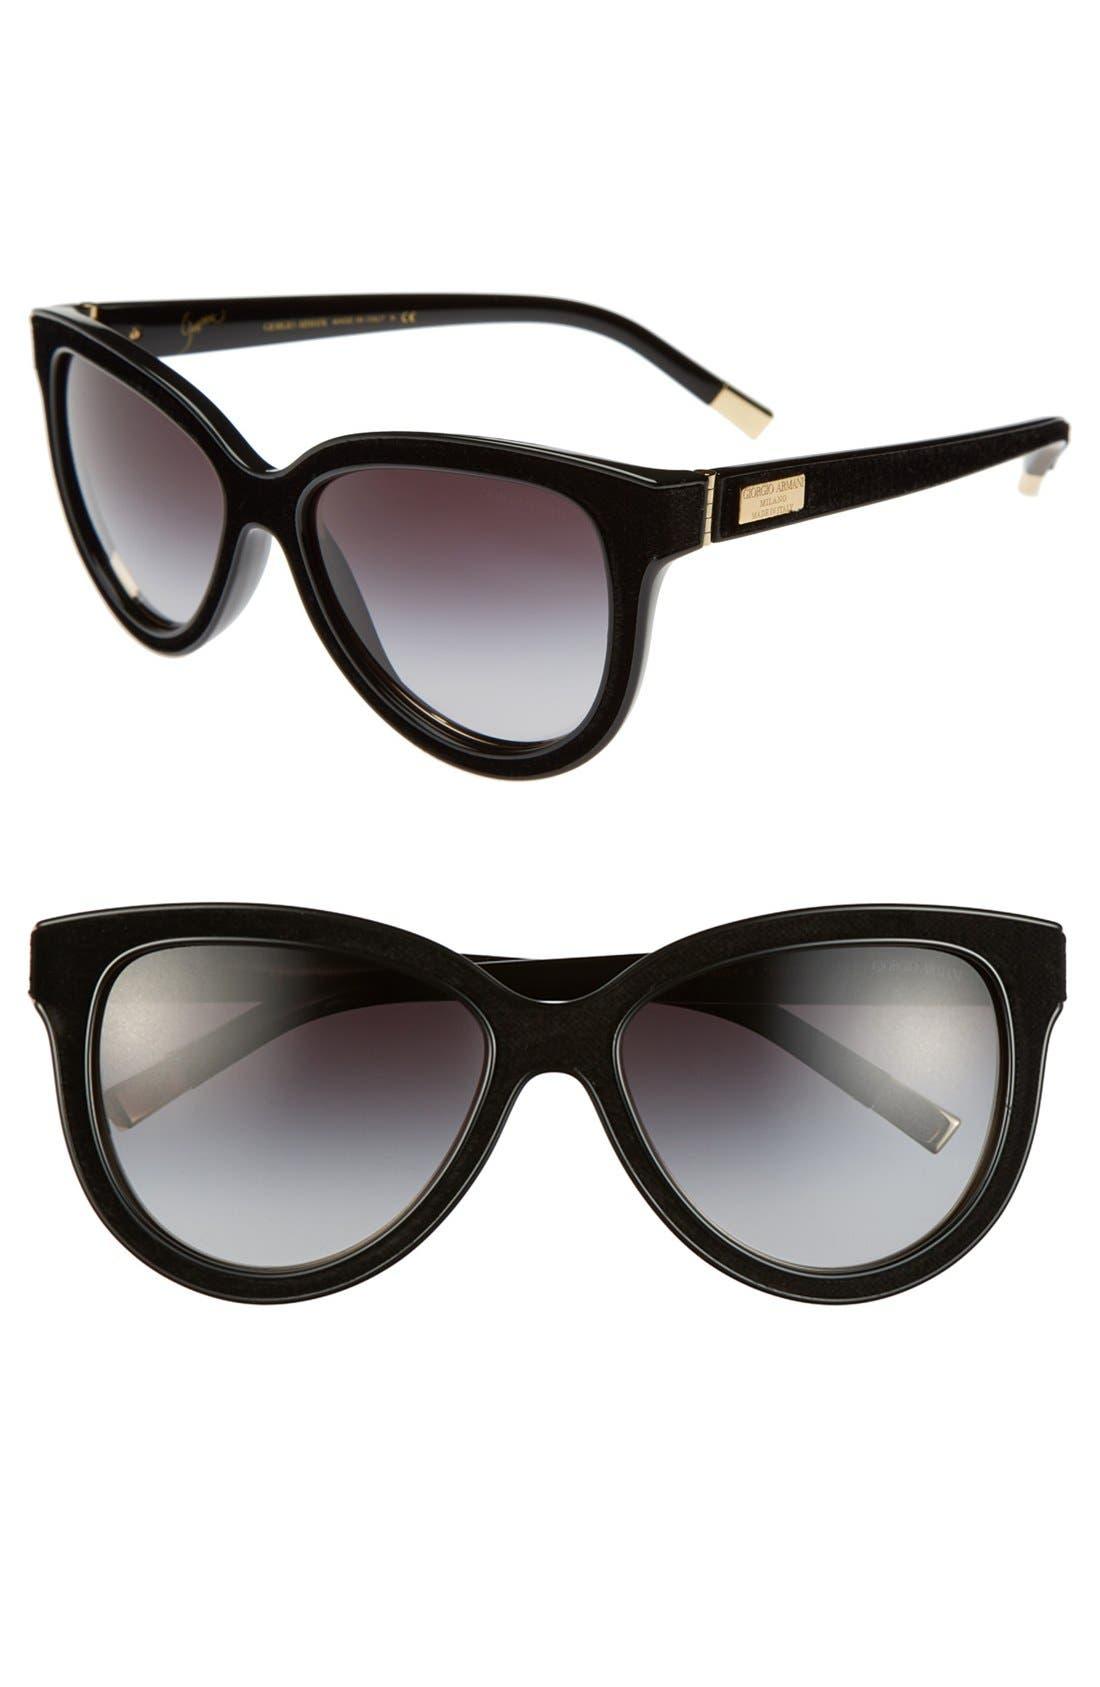 Main Image - Giorgio Armani 'Garçonne' 57mm Cat Eye Sunglasses